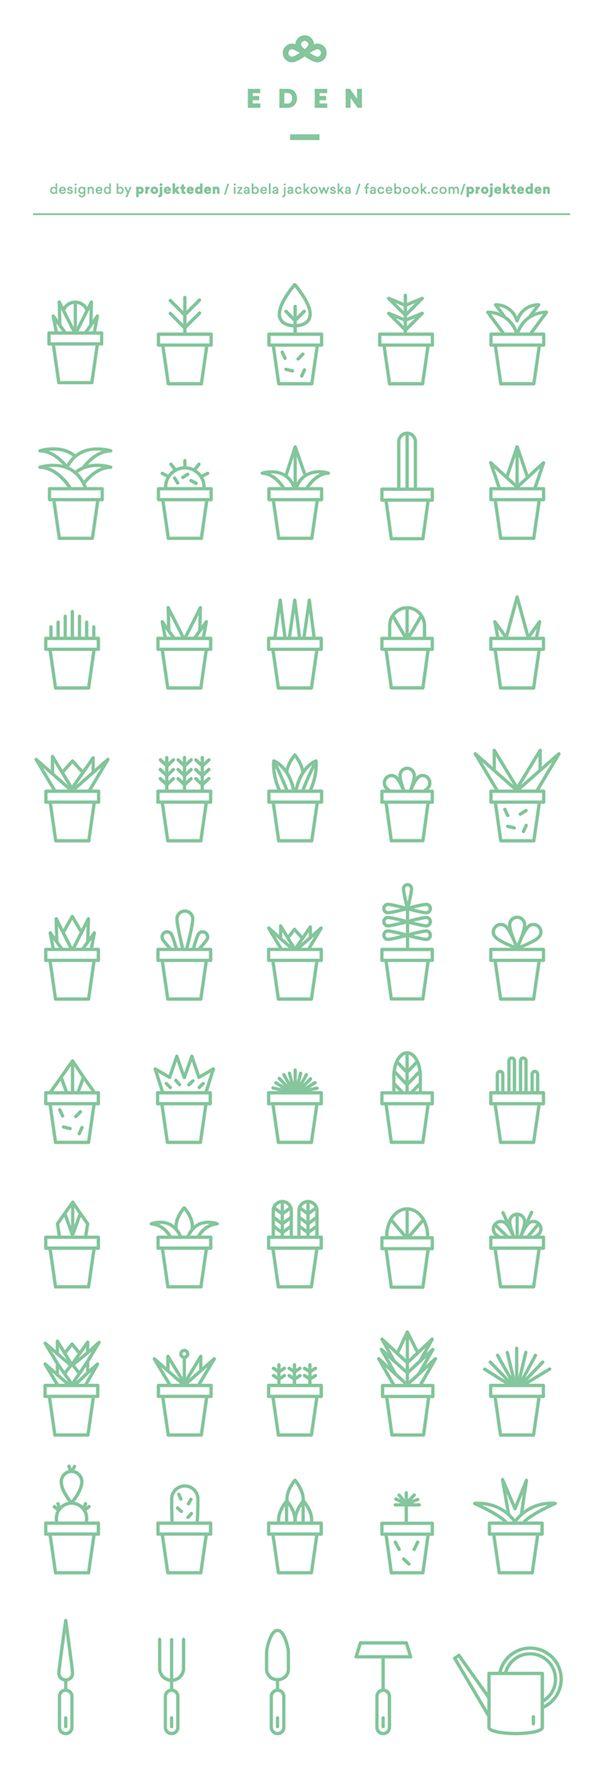 https://www.behance.net/gallery/24695383/Succulent-icon-set-free-download